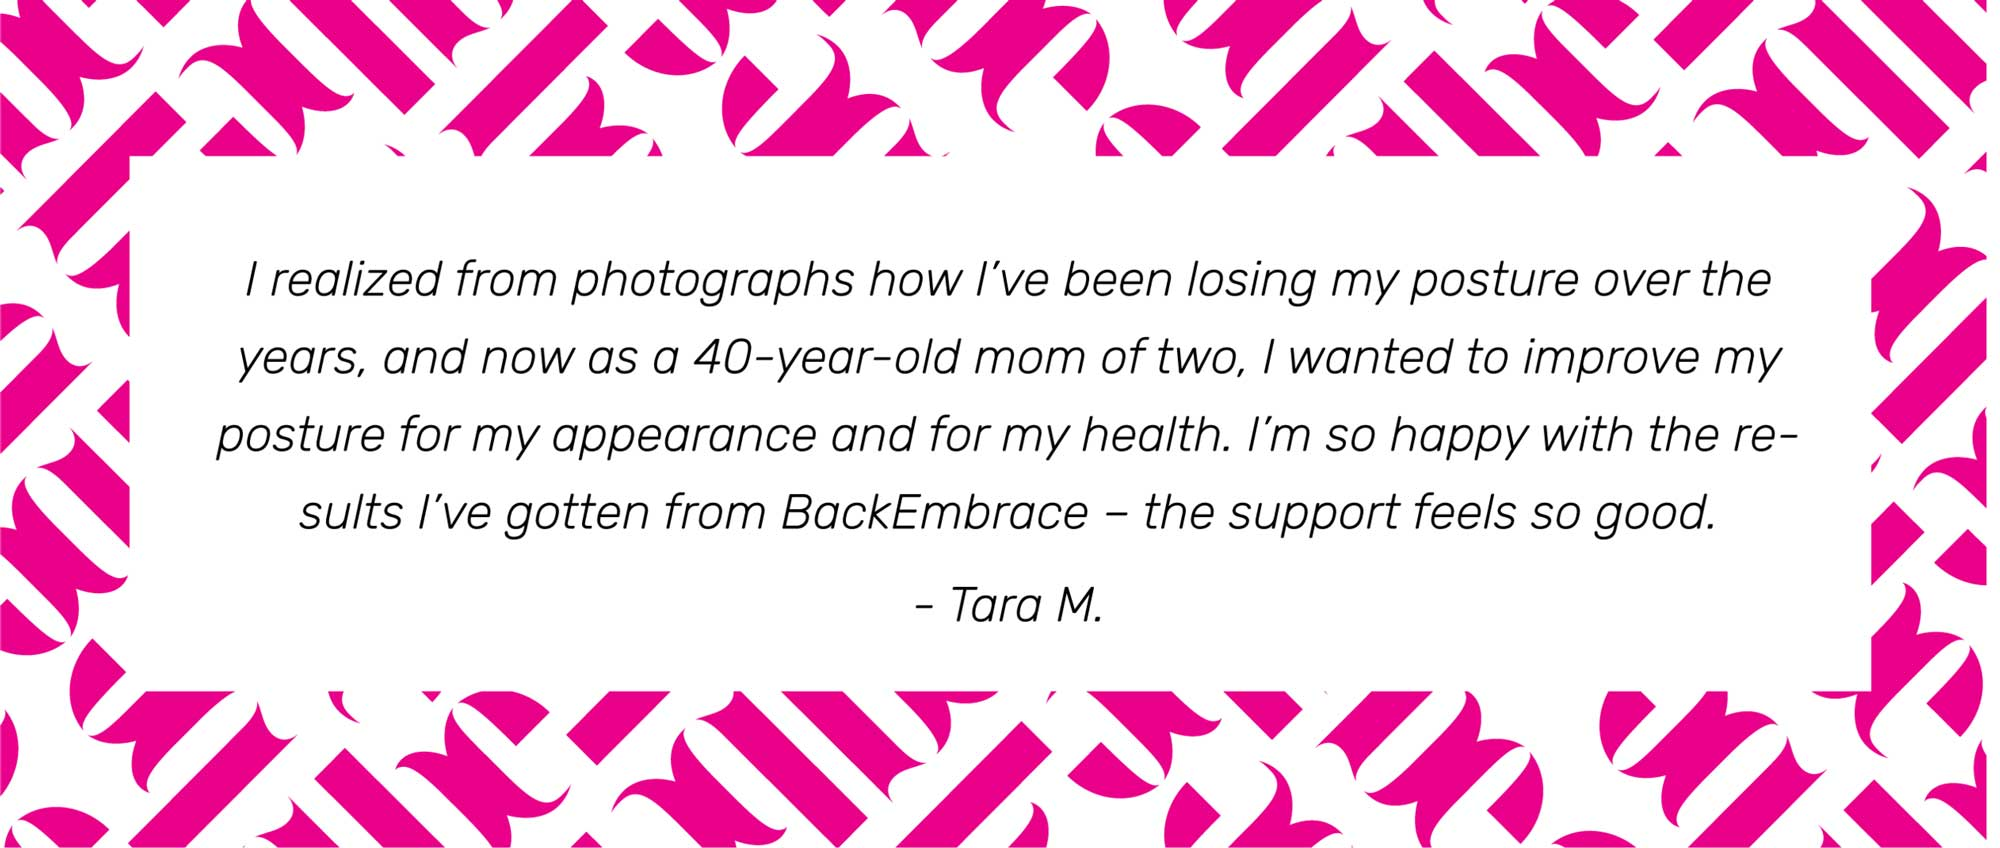 back-embrace-testimonial-7